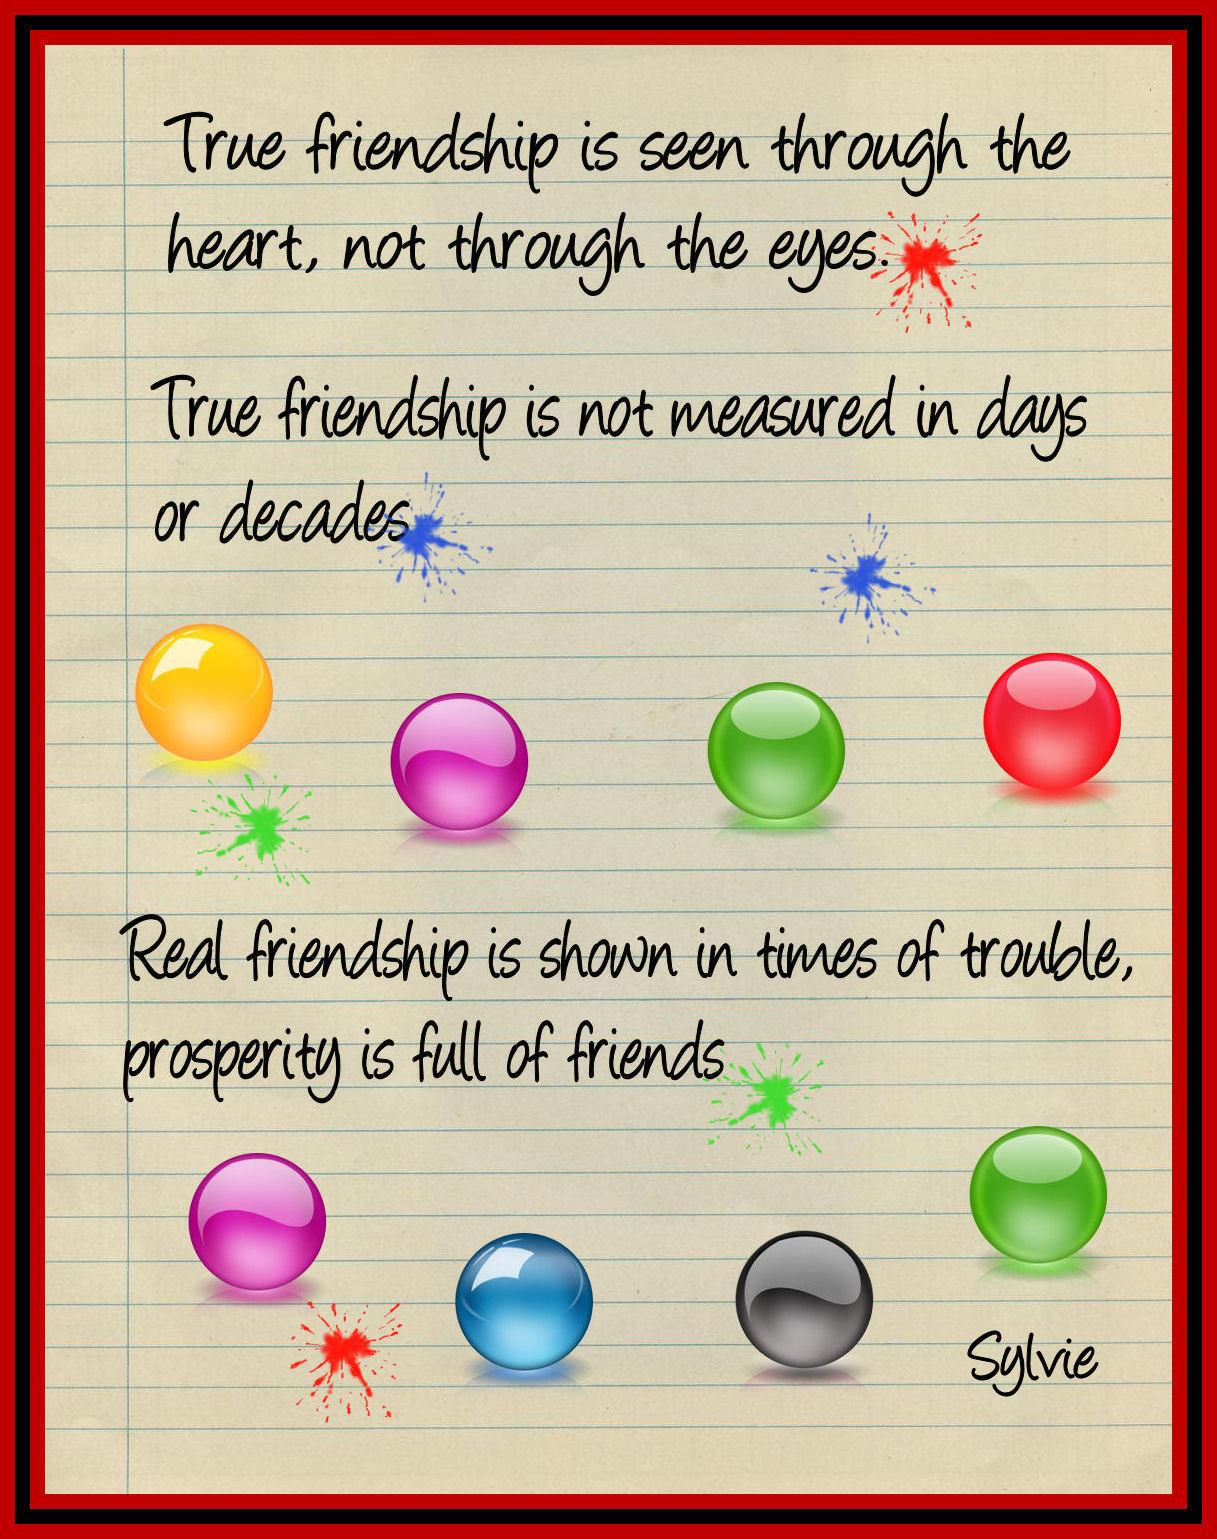 Kata Kata Mutiara Persahabatan Bahasa Inggris Gambar Unik Lucu